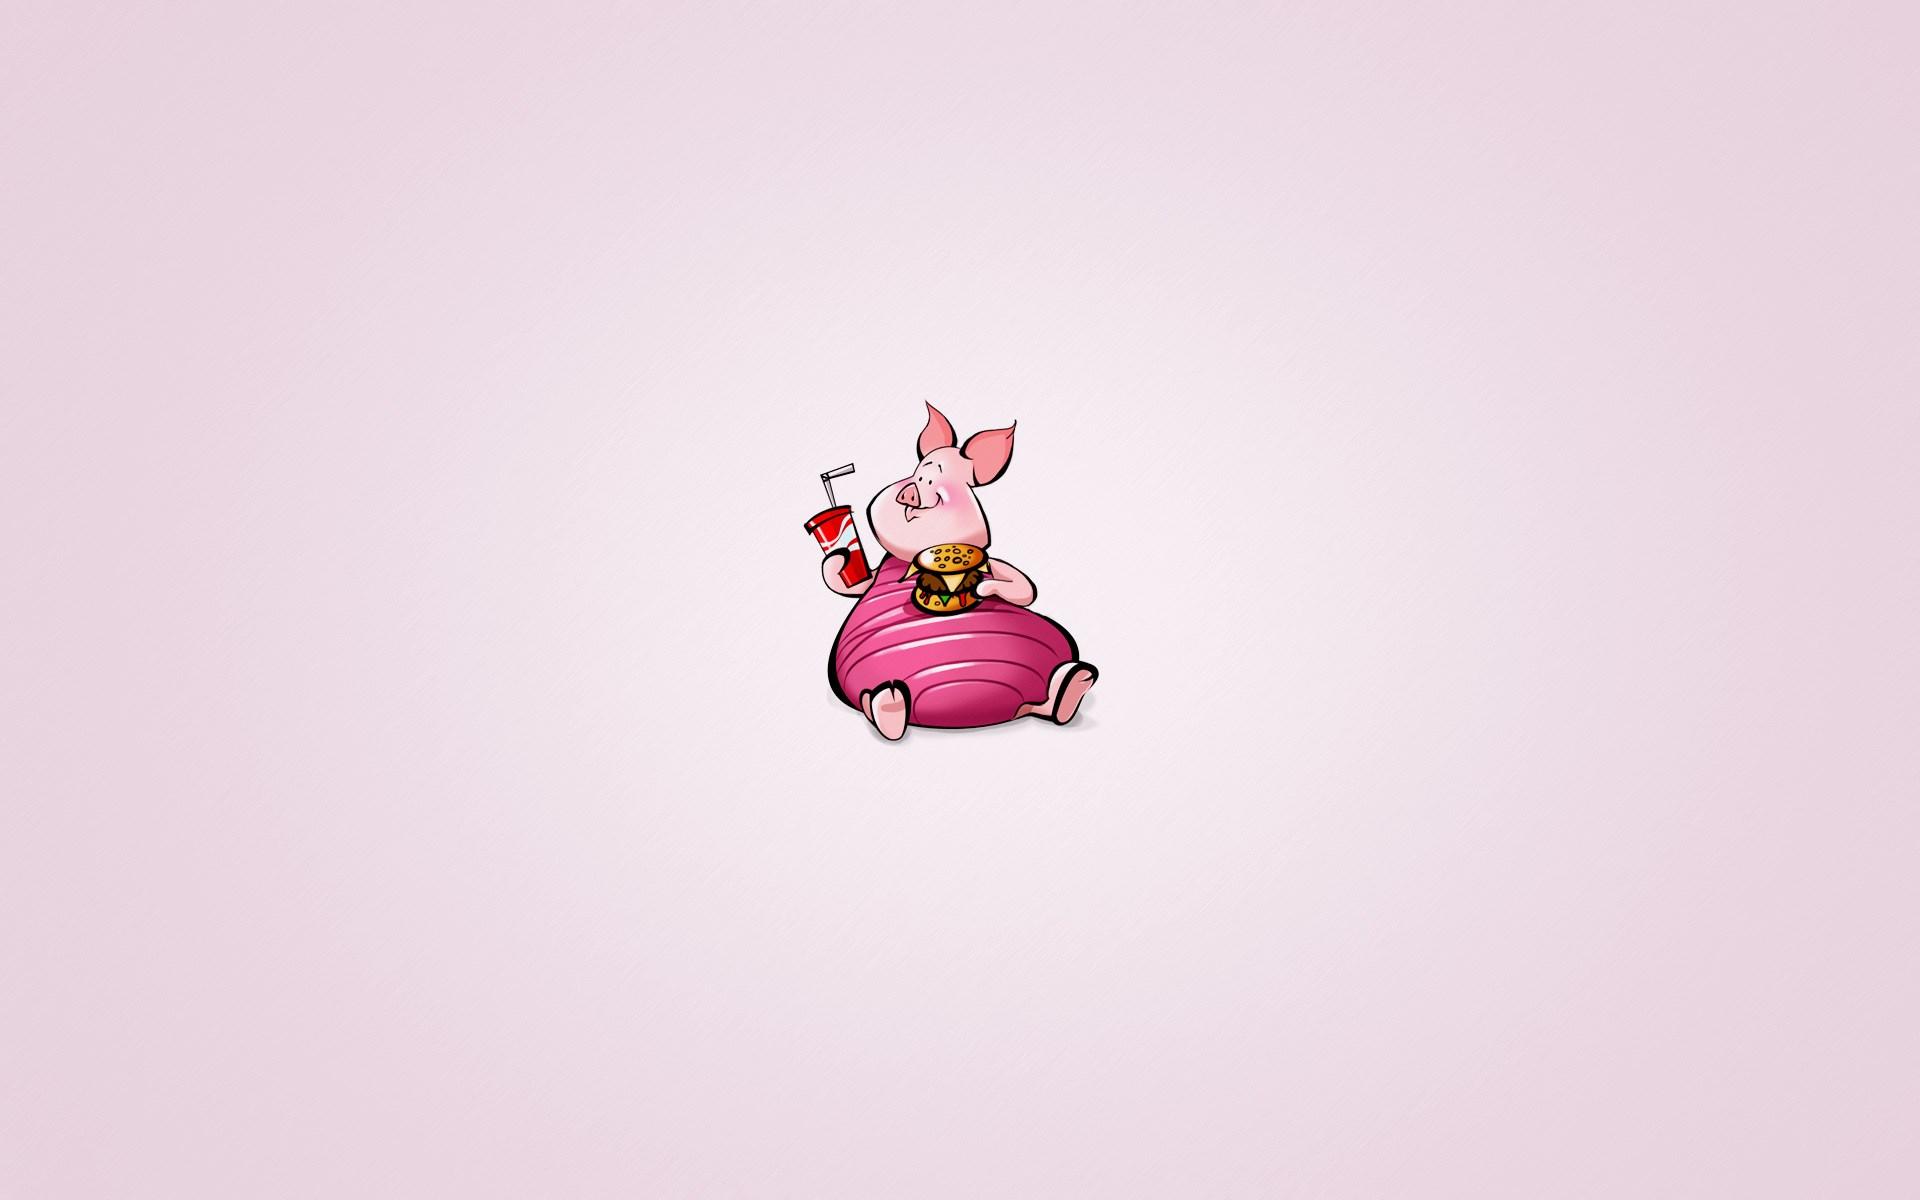 Winnie-the-Pooh Piglet Cartoon Funny